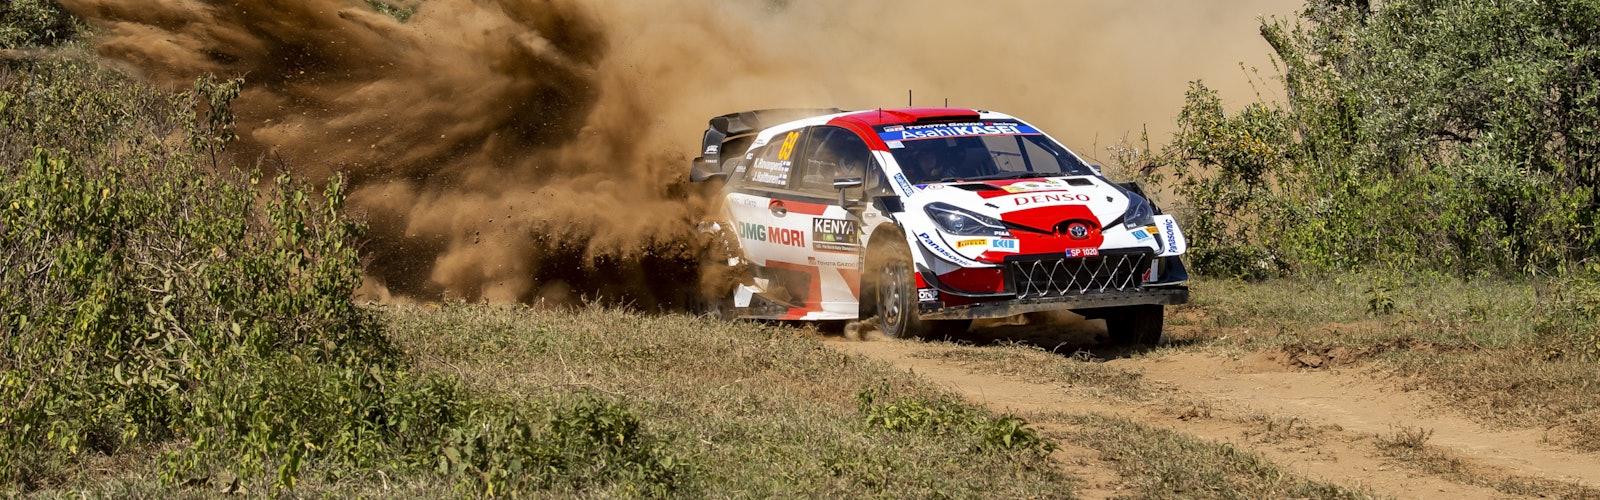 WRC_2021_Rd.6_130